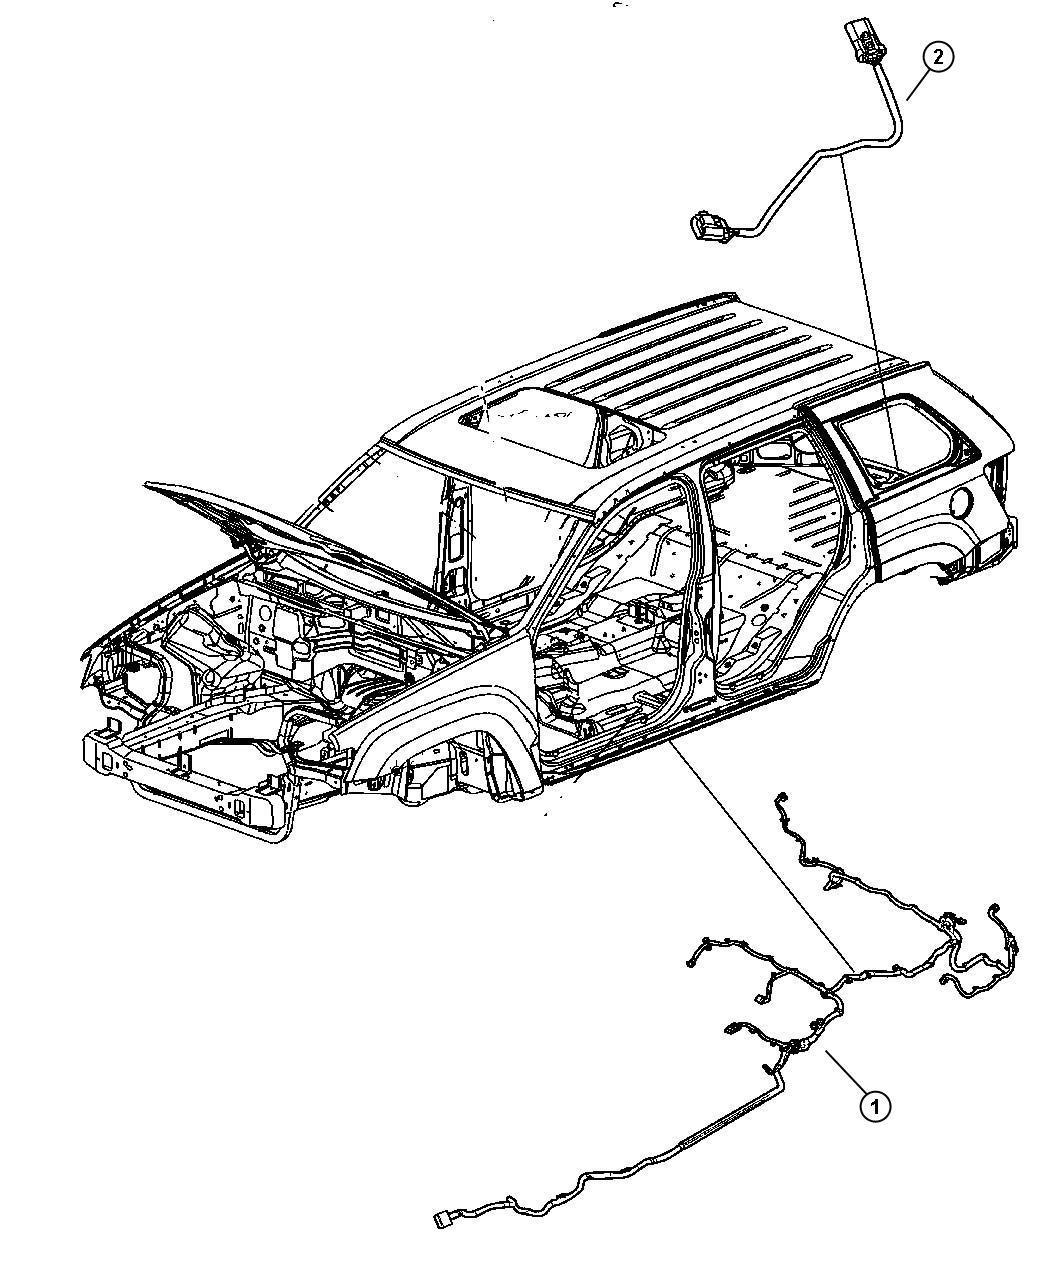 2008 Jeep Grand Cherokee Wiring. Underbody